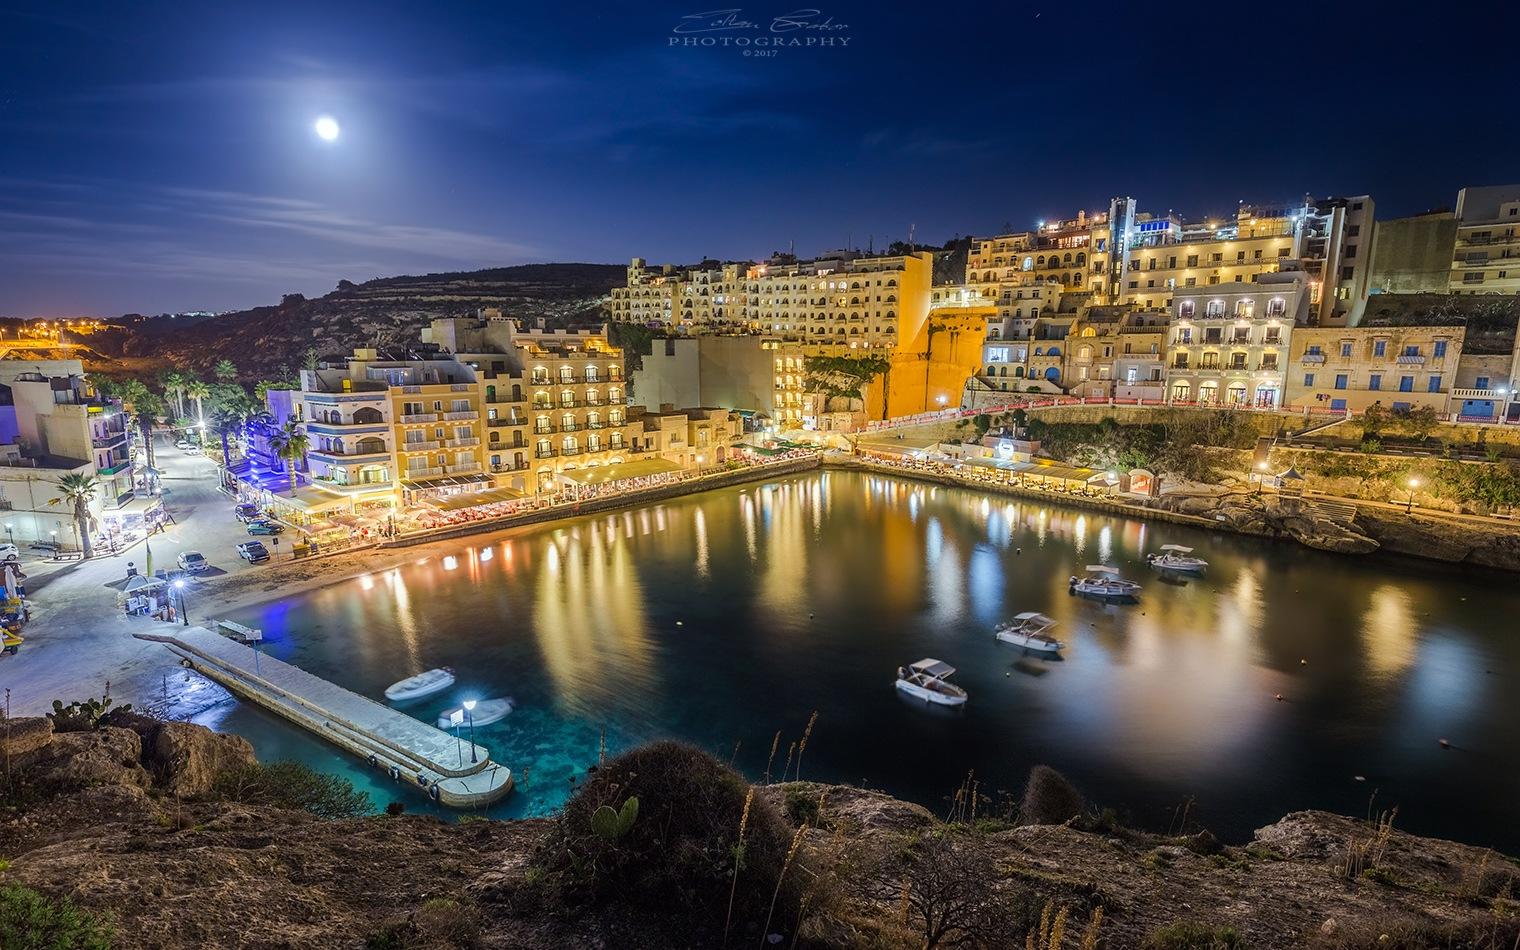 Night shot of the beautiful Xlendi bay on the island of Gozo - Malta by Zoltan Gabor